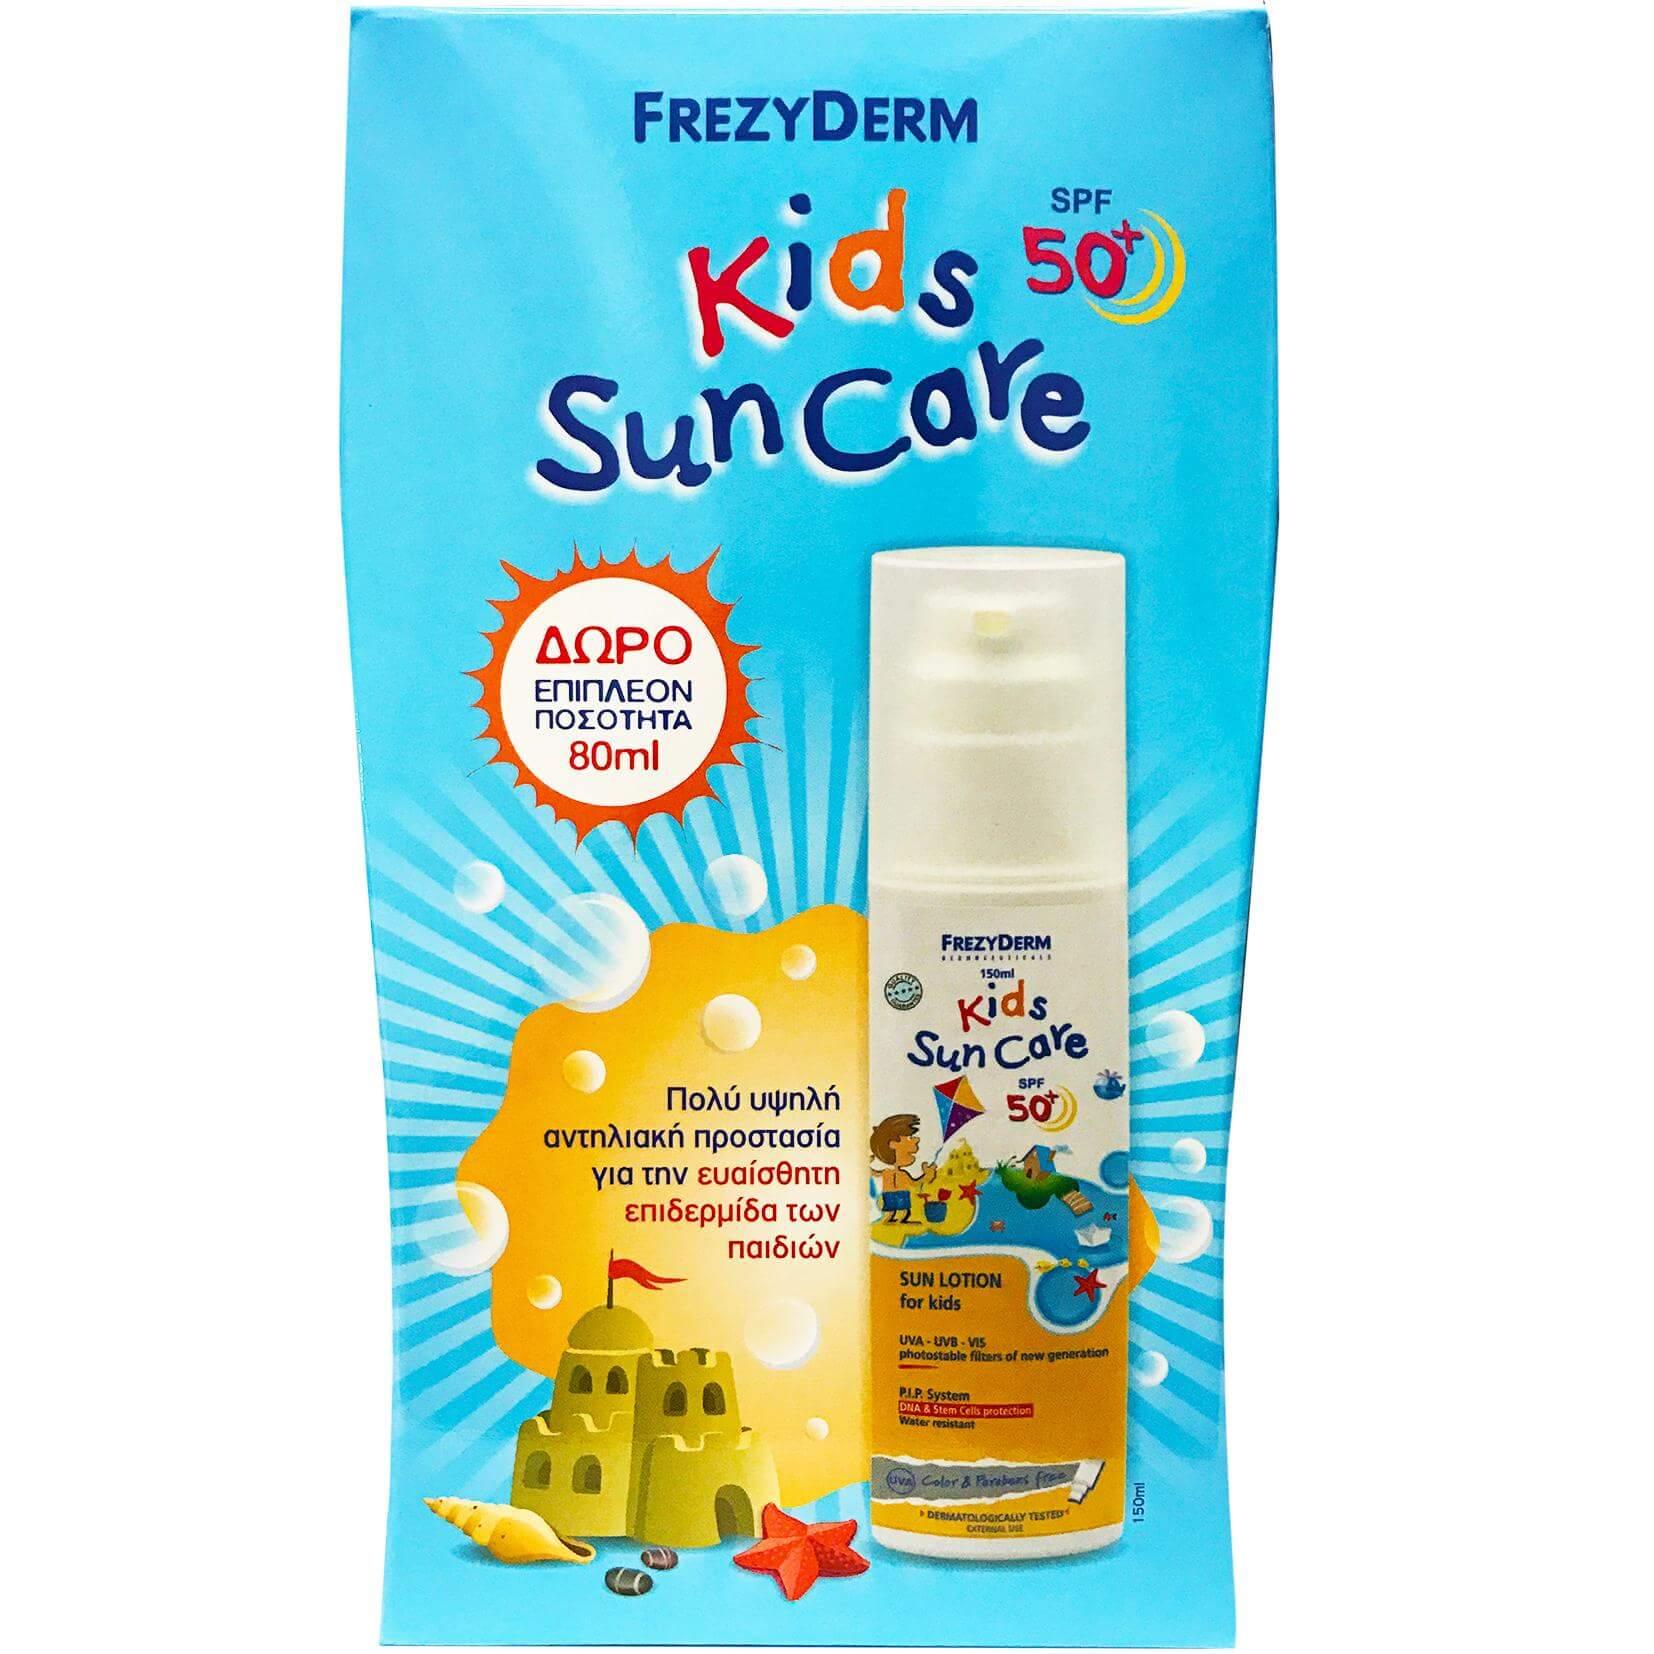 Frezyderm Kids Sun Care Spf50+ Υψηλή Αντιηλιακή Προστασία για την Ευαίσθητη Παιδική Επιδερμίδα 150ml + Δώρο Επιπλέον 80ml